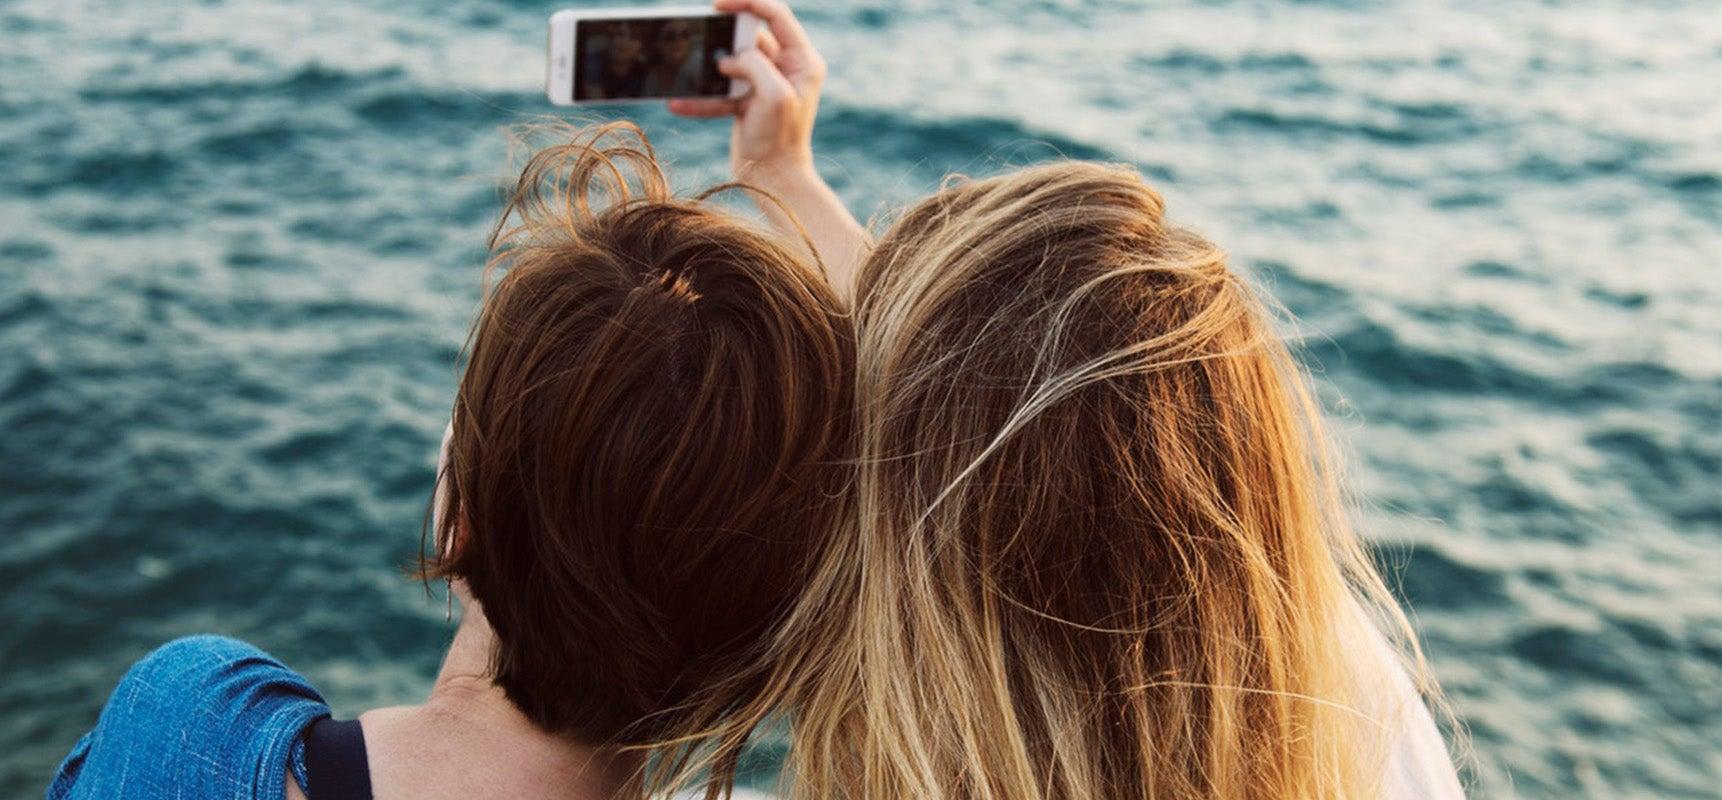 3 Teknik Selfie Maksimal Supaya Selfie-mu Banjir Likes